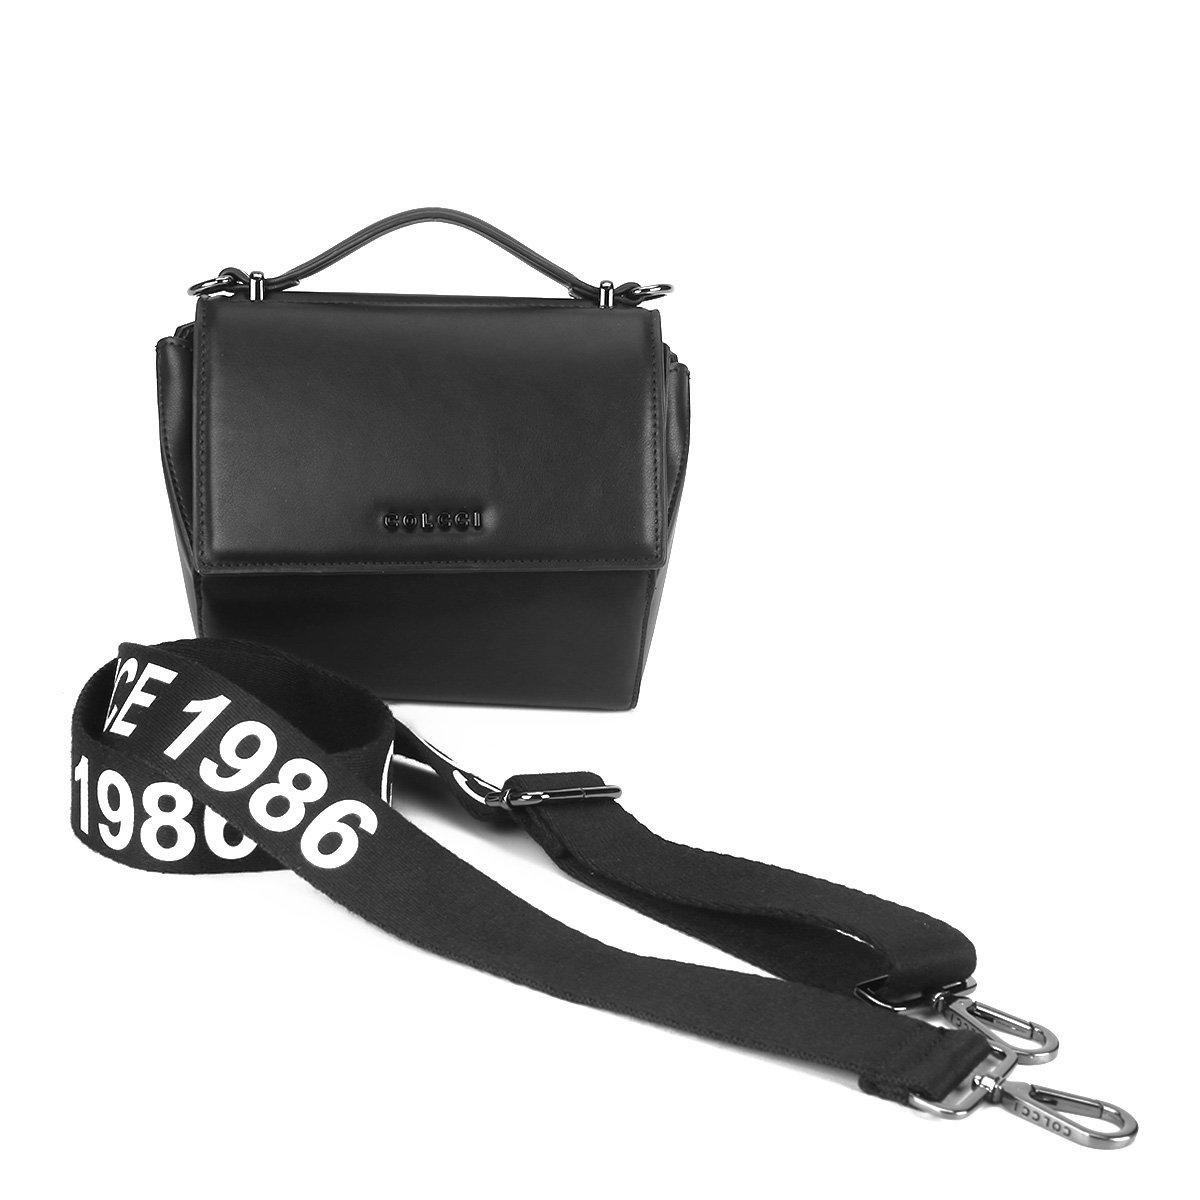 Sporting Bolsa Feminina Bag Preto Mini Bolsa Colcci Colcci Mini Alça wwrqHg0